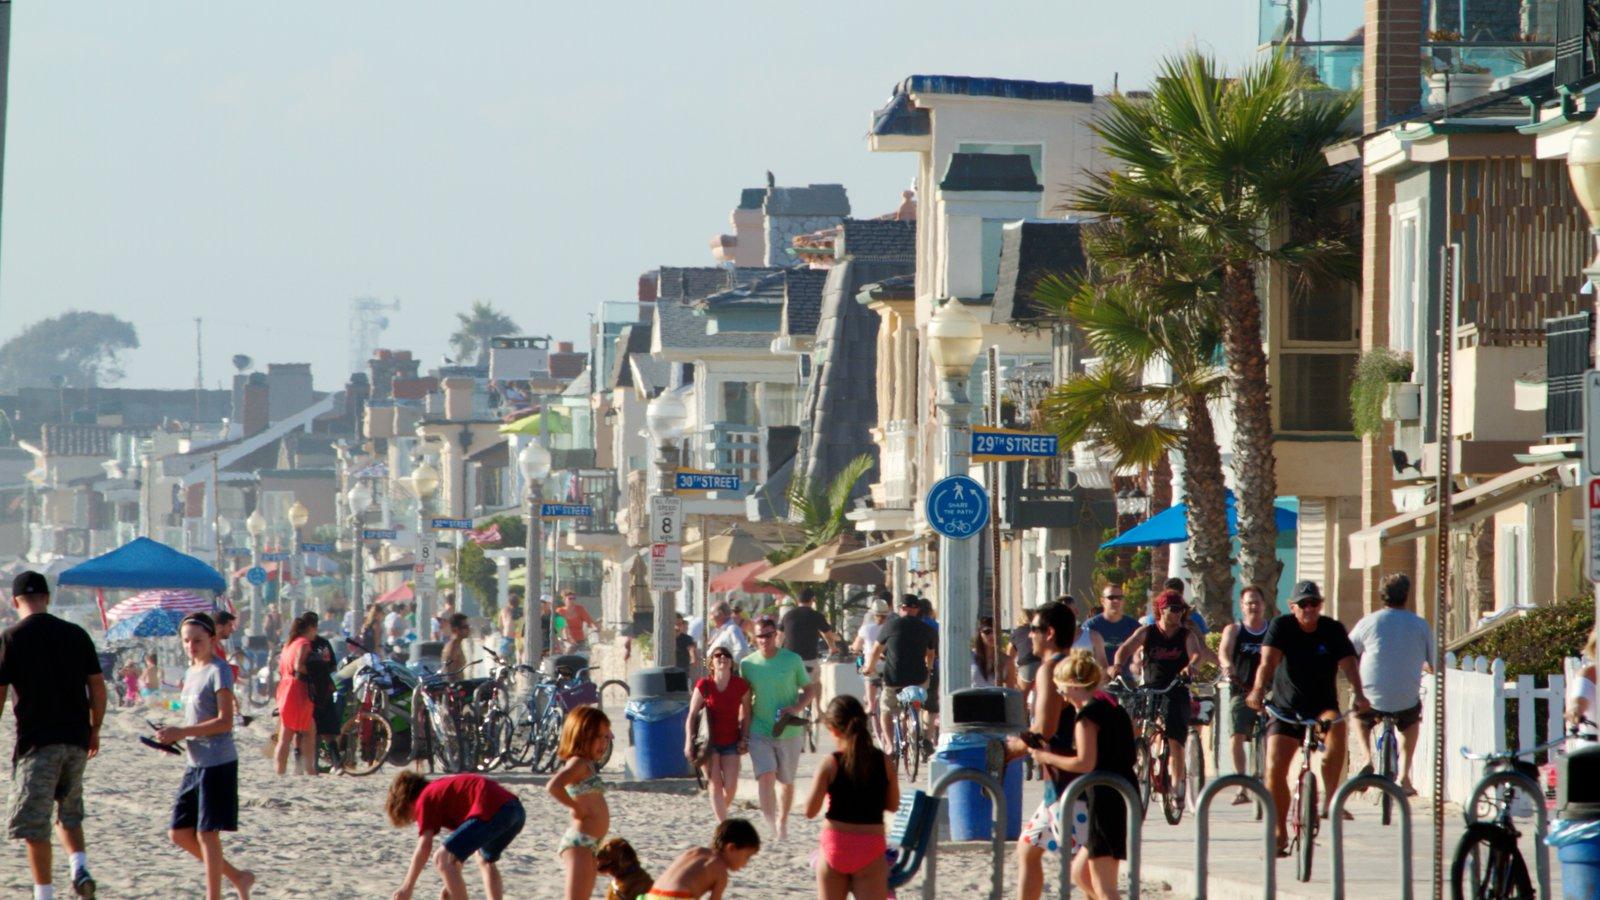 5 Tourist Spots Near Uc Irvine